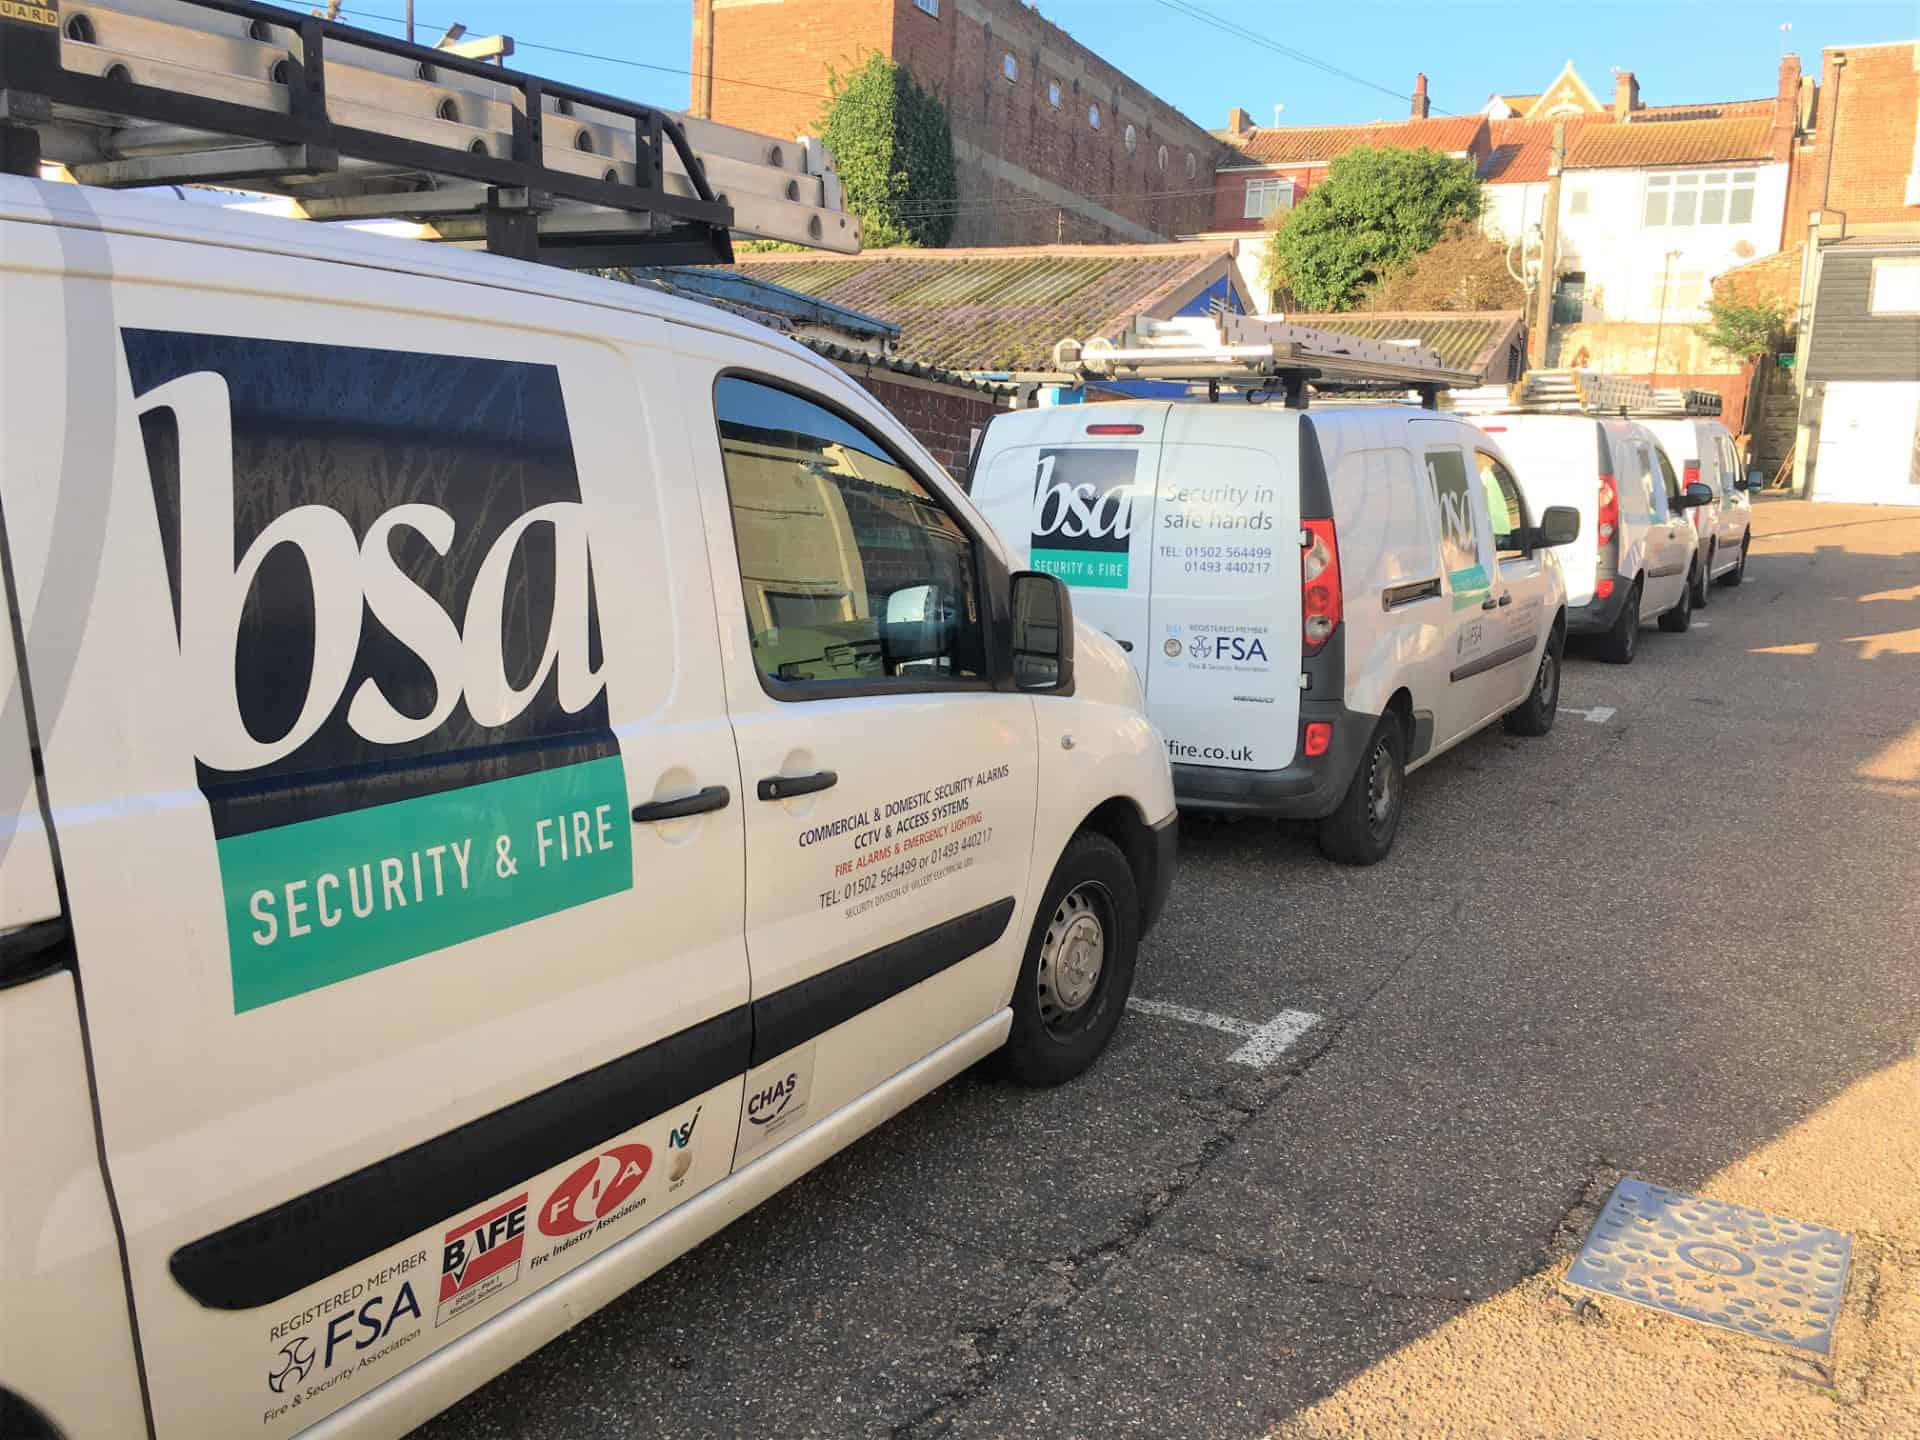 BSA Security and Fire Vans